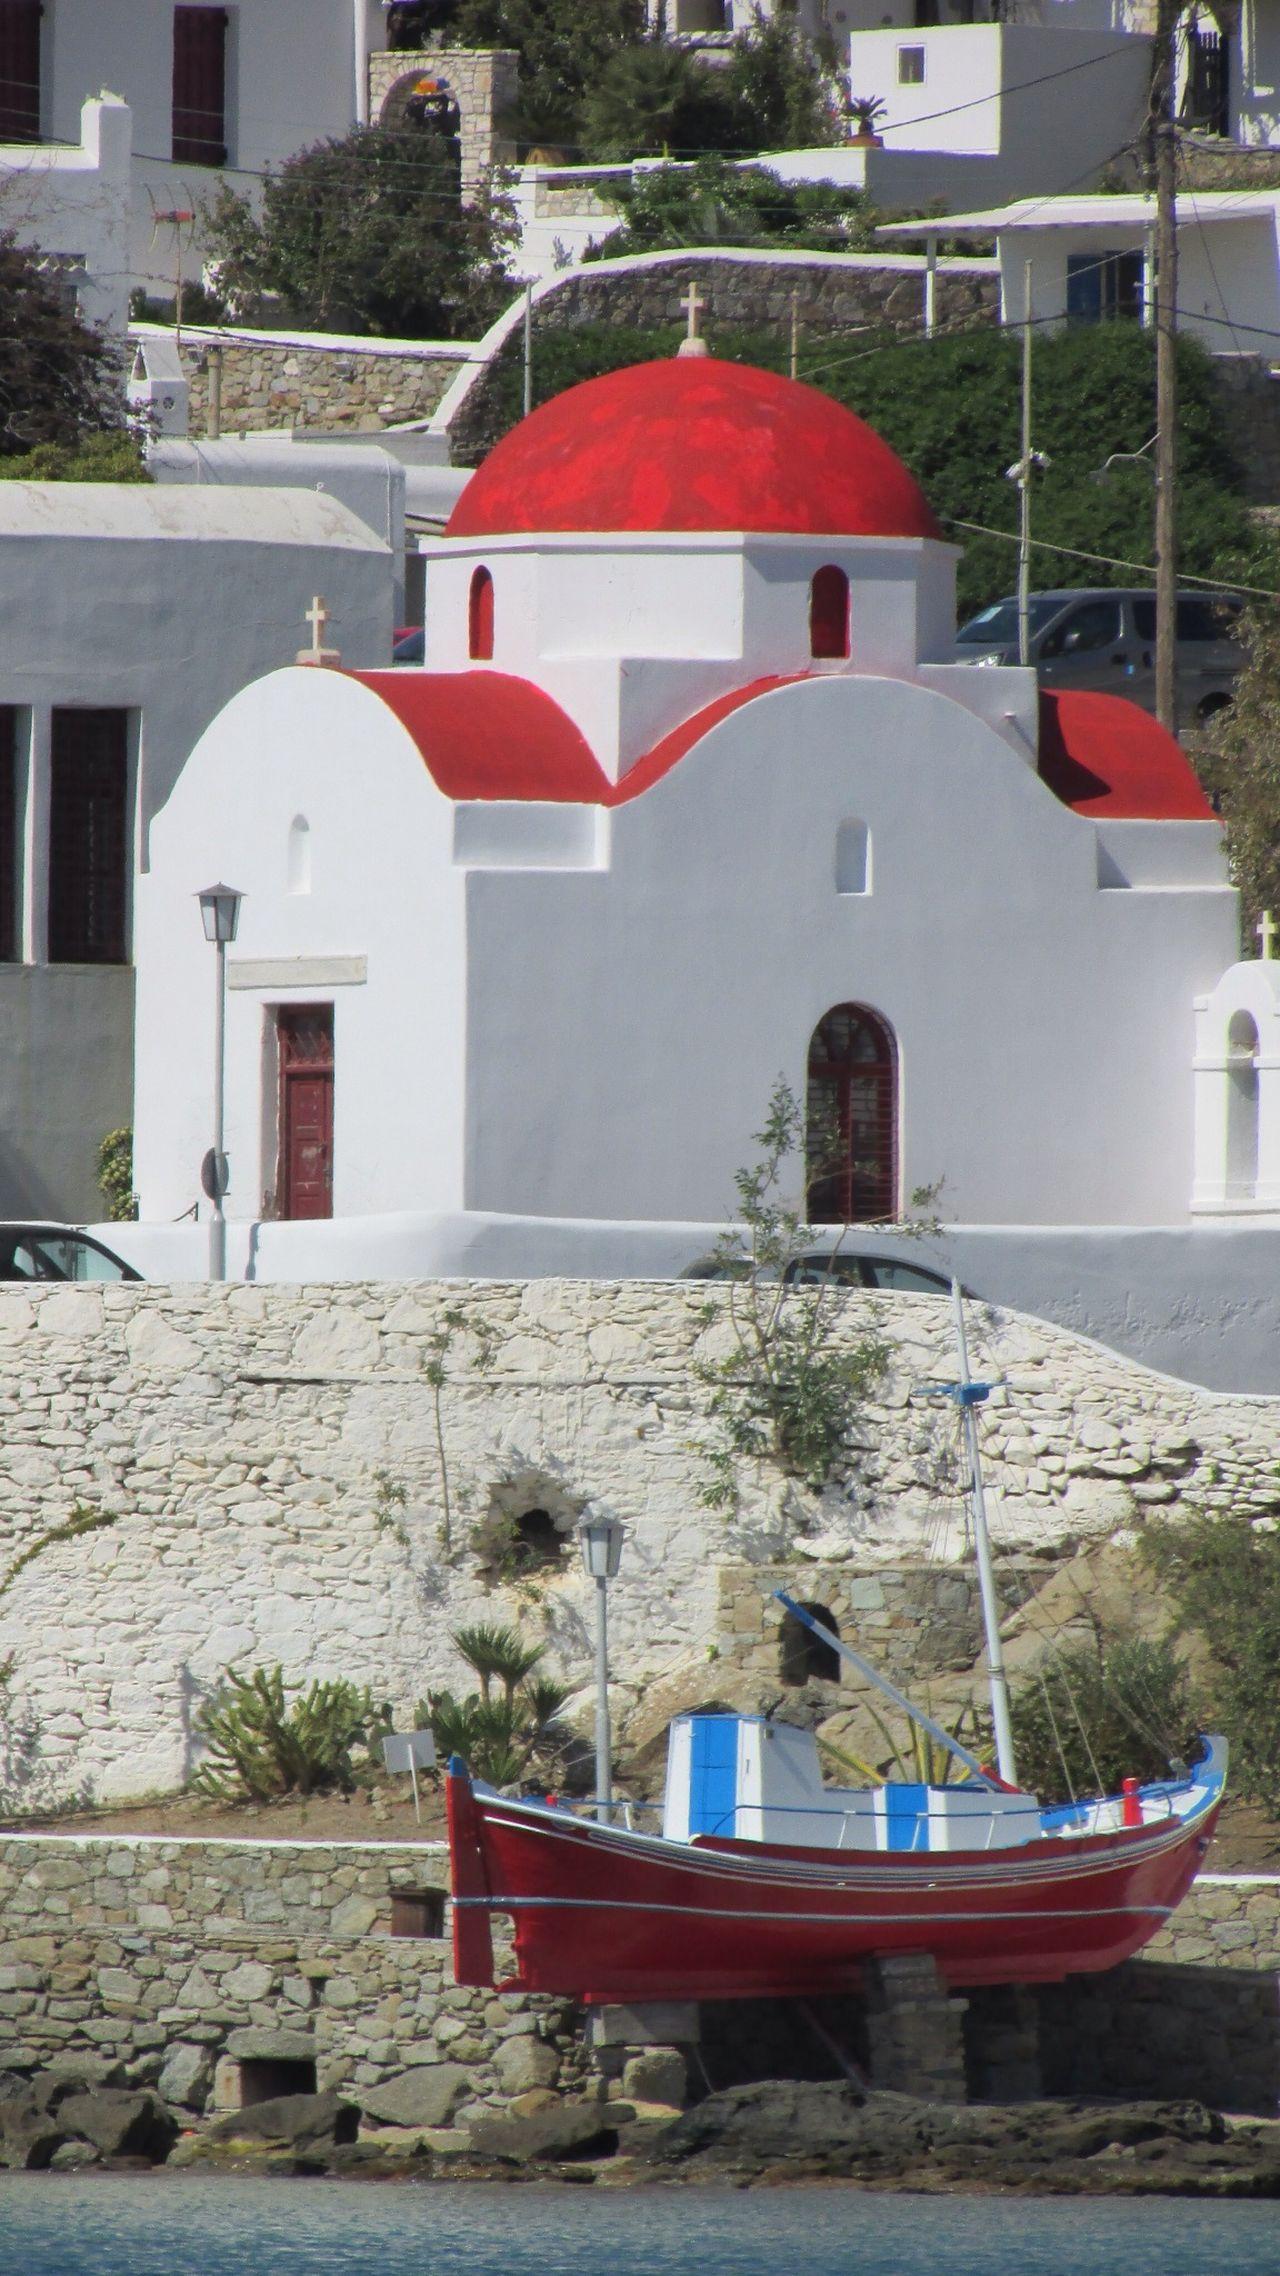 GREECE ♥♥ Mykonos Churches Travel Greece Church Row Boat Ancient Architecture Seascape